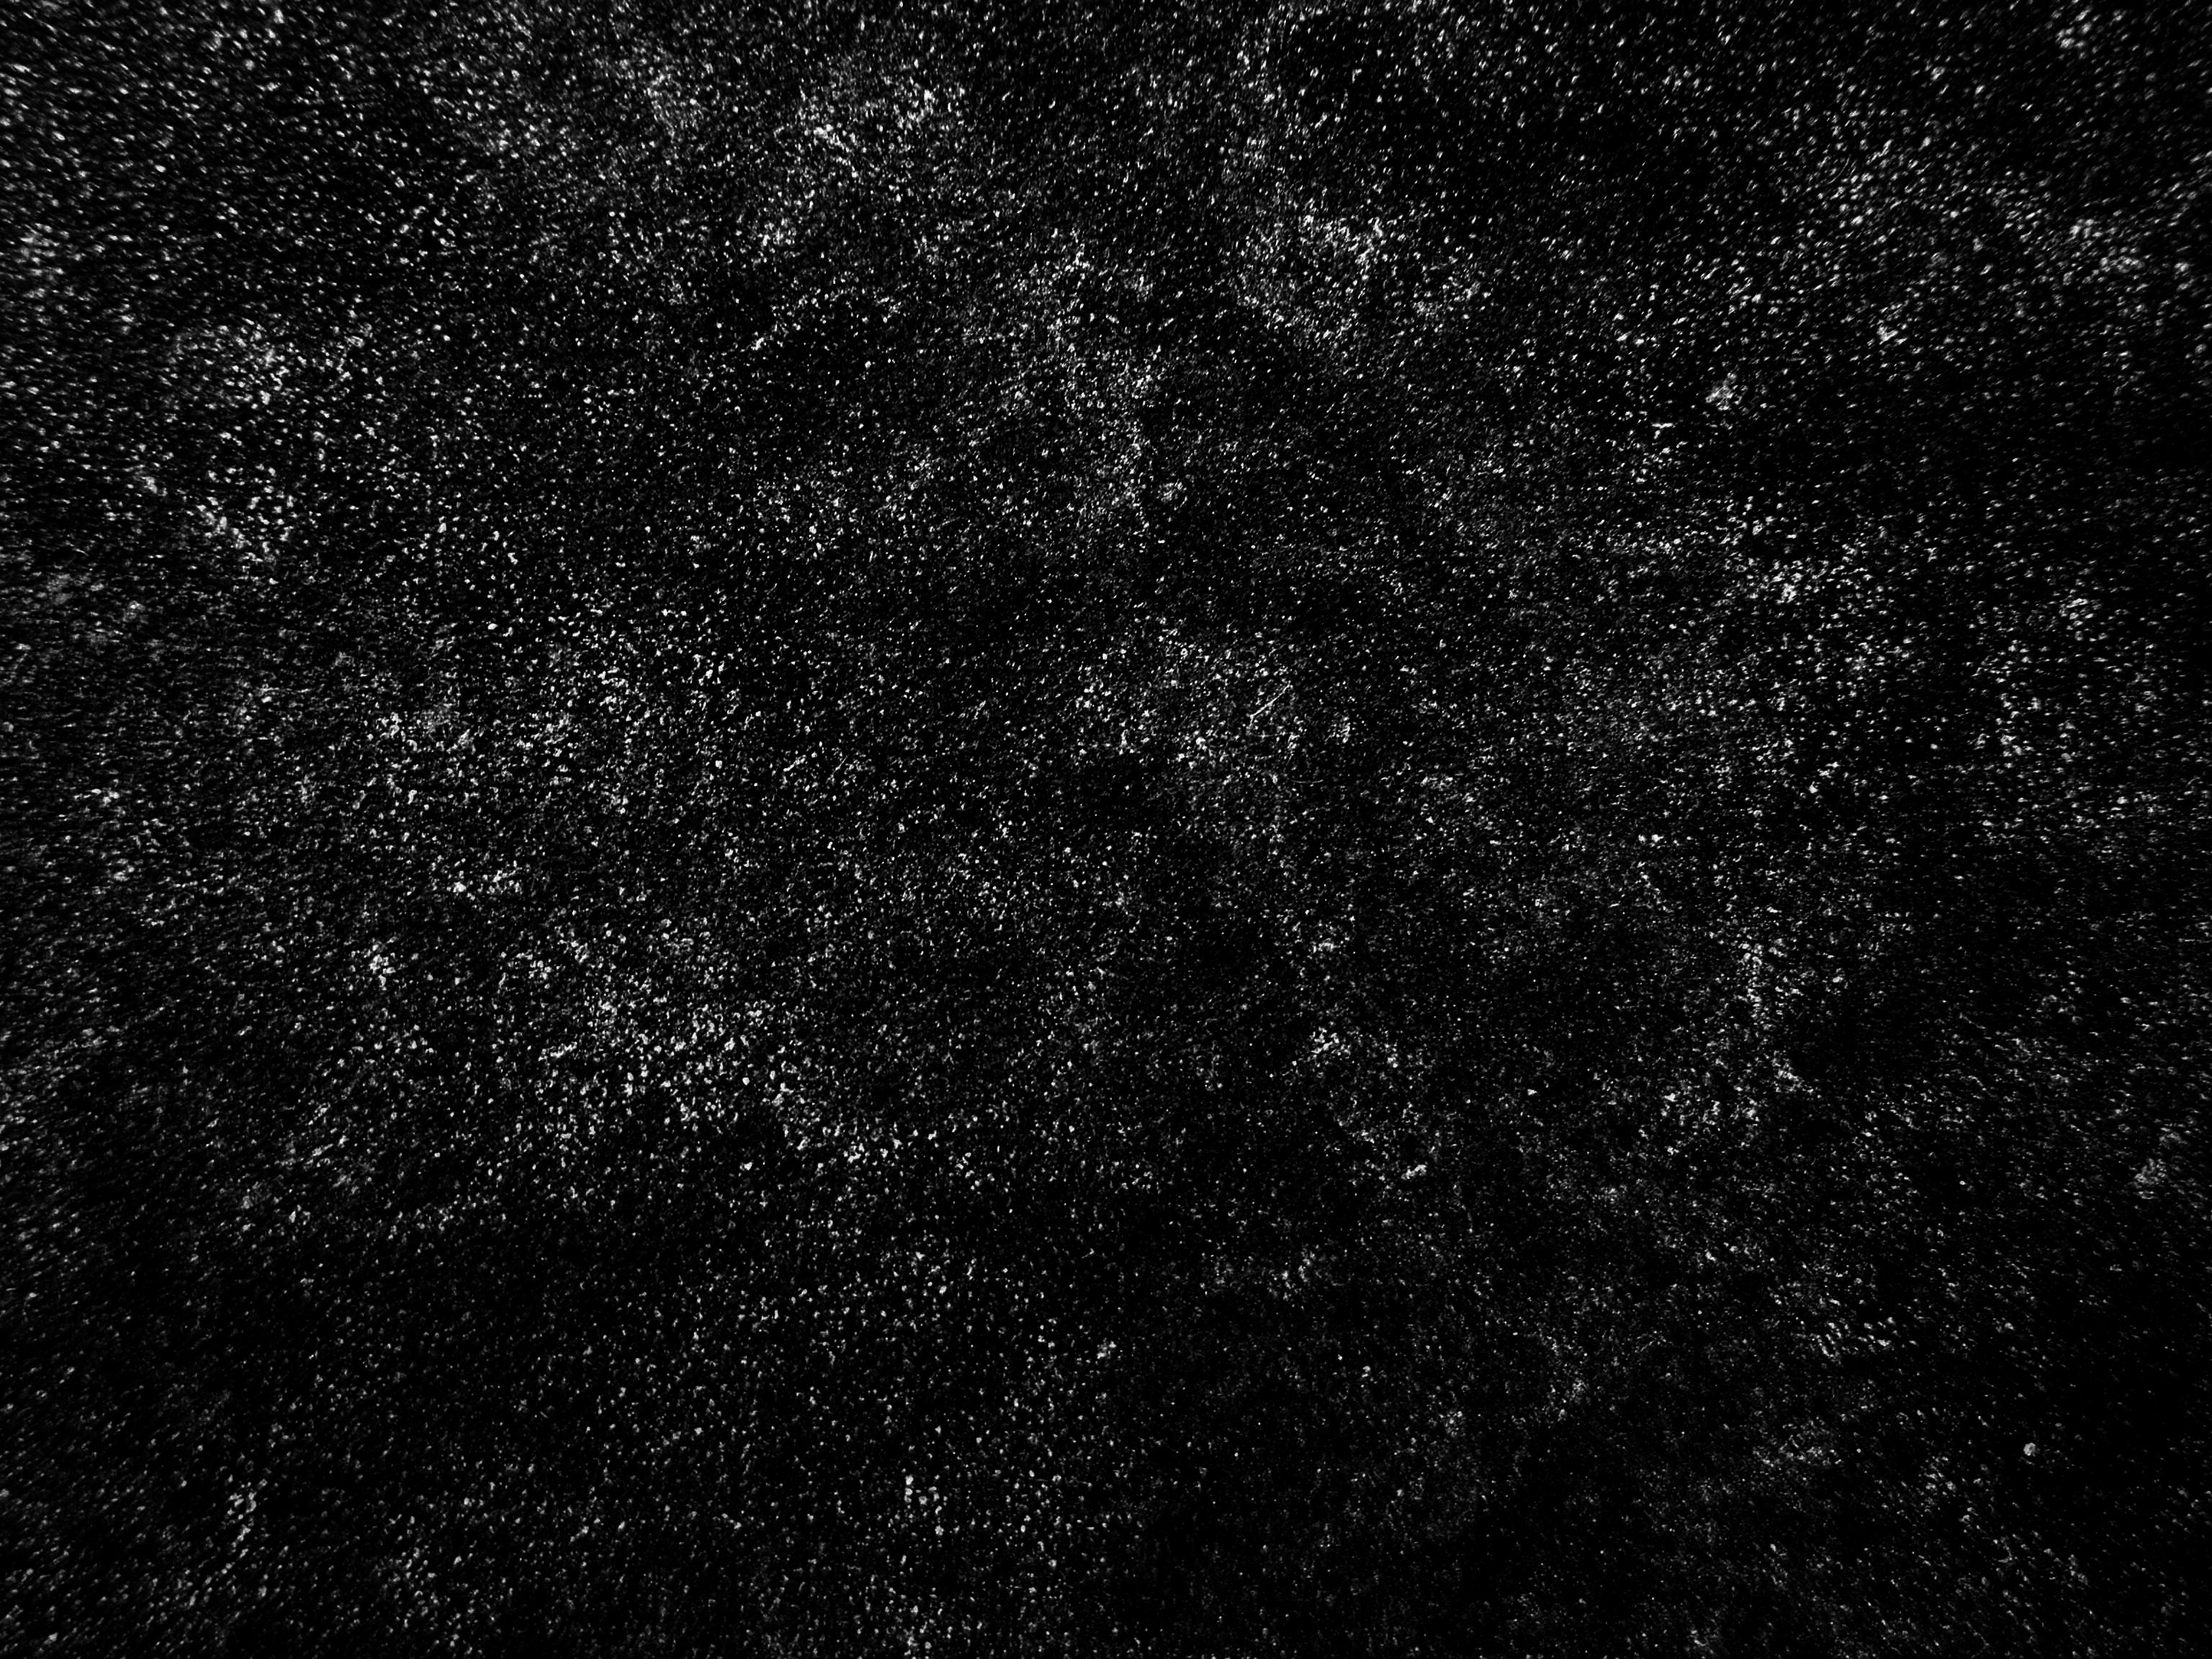 Grunge noise texture photo